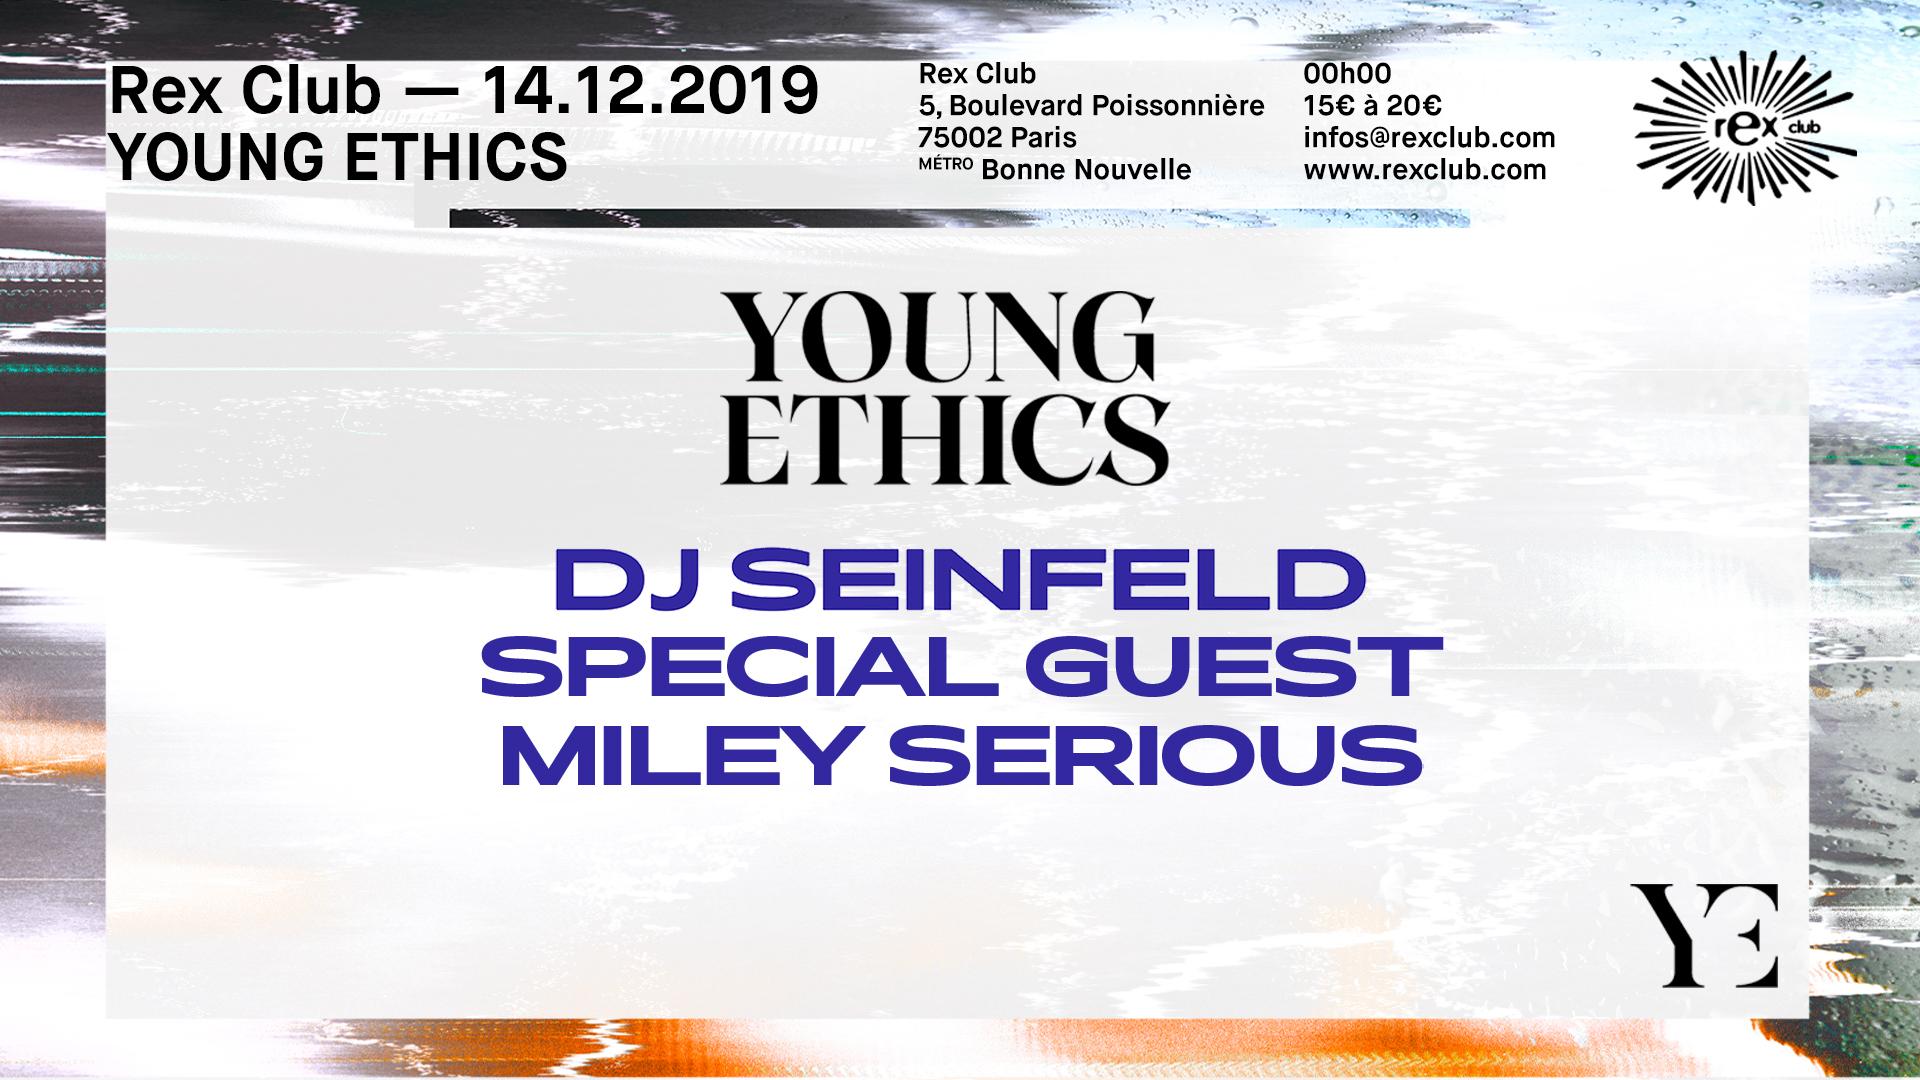 Rex Club presente Young Ethics Tour: DJ Seinfeld, Miley Serious